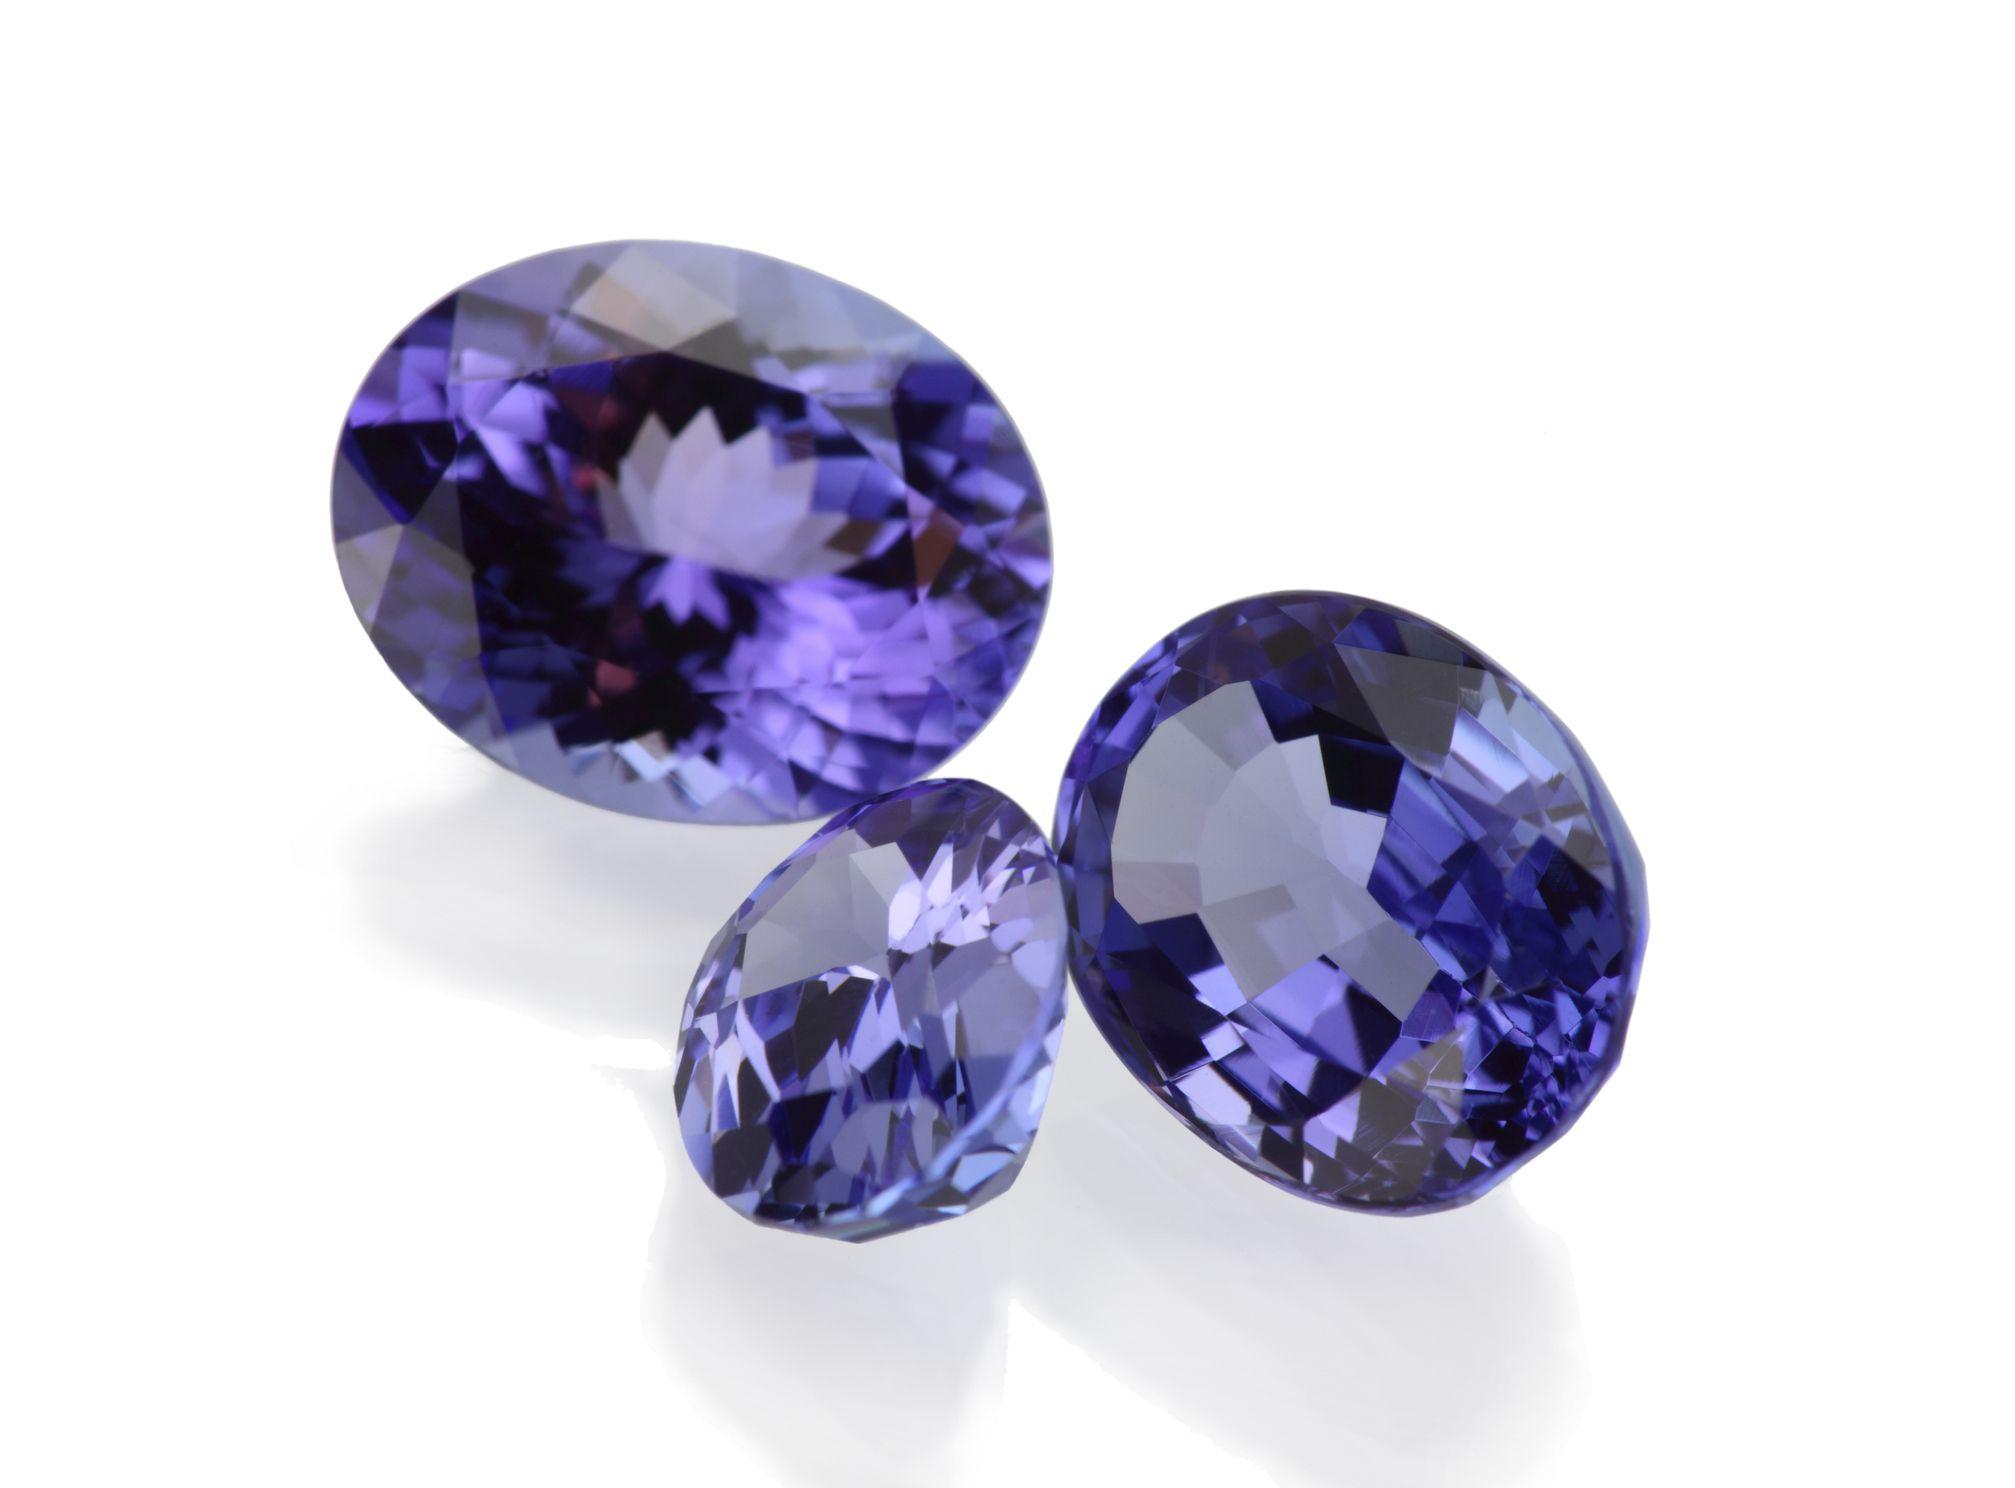 three tanzanite gems